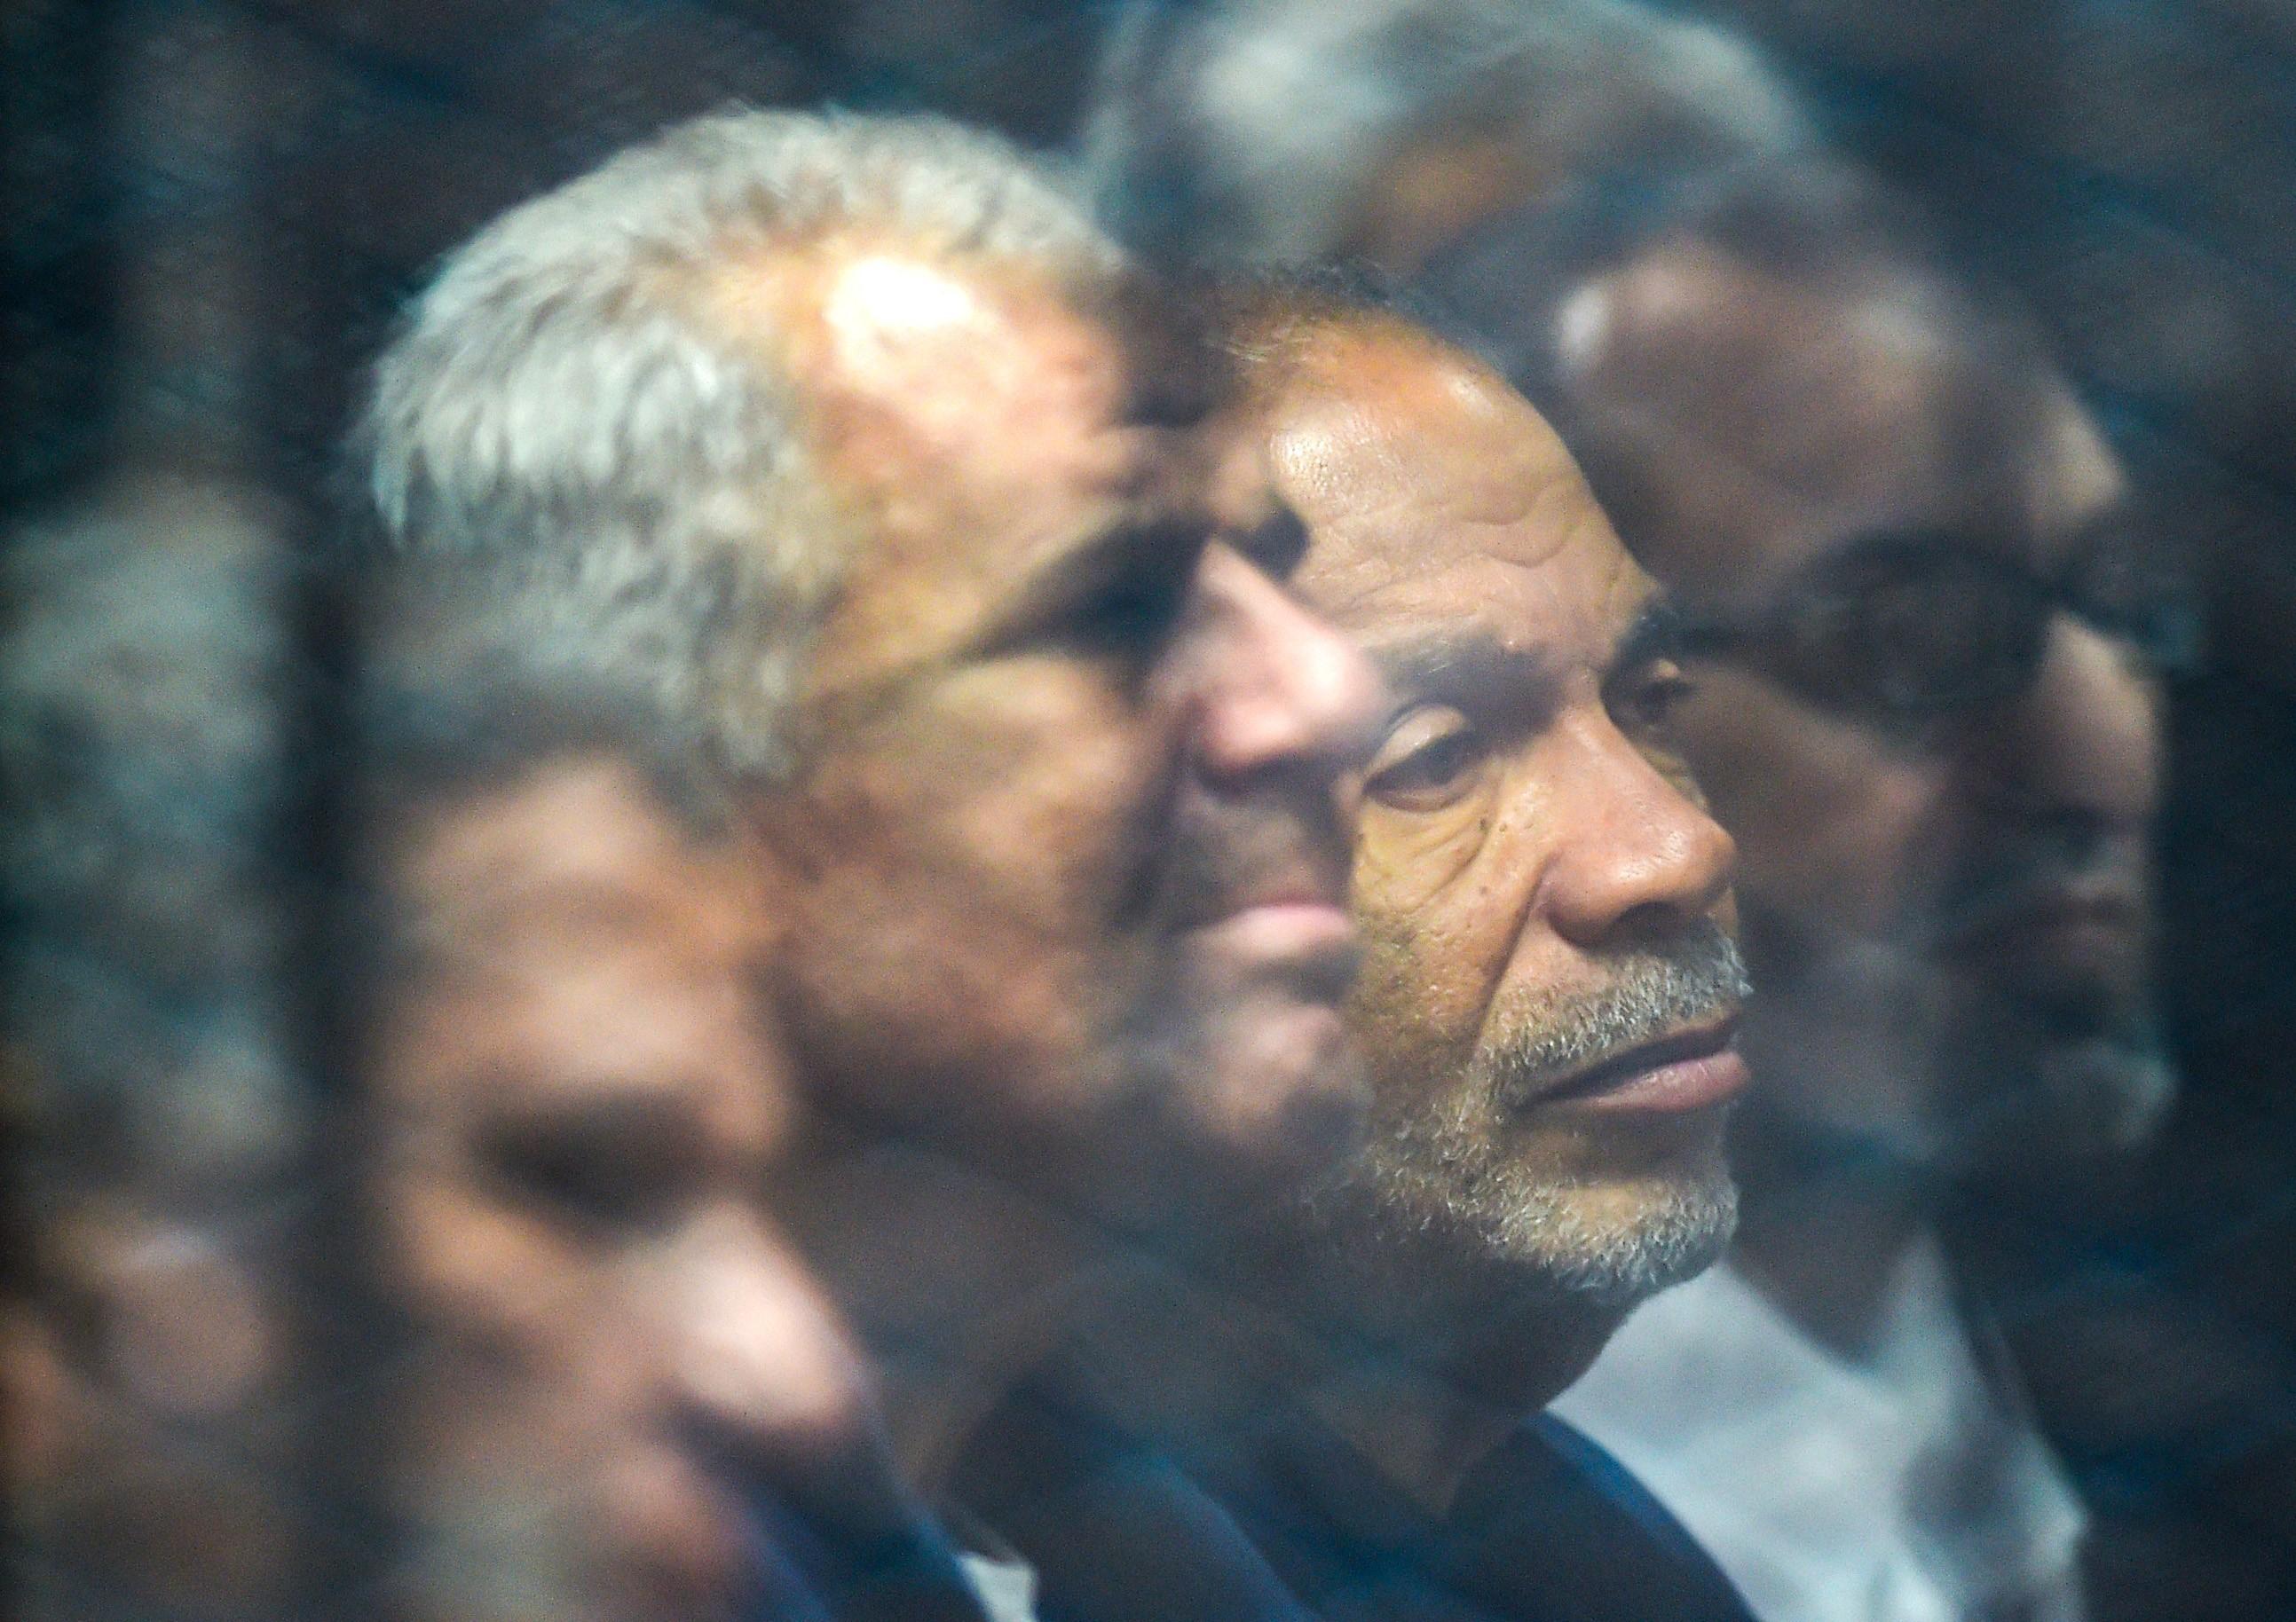 Senior Muslim Brotherhood member and former Egyptian parliament speaker Saad al-Katatni (C-R) alongside fellow member Sobhy Saleh during their trial, 2 December 2018 (AFP)